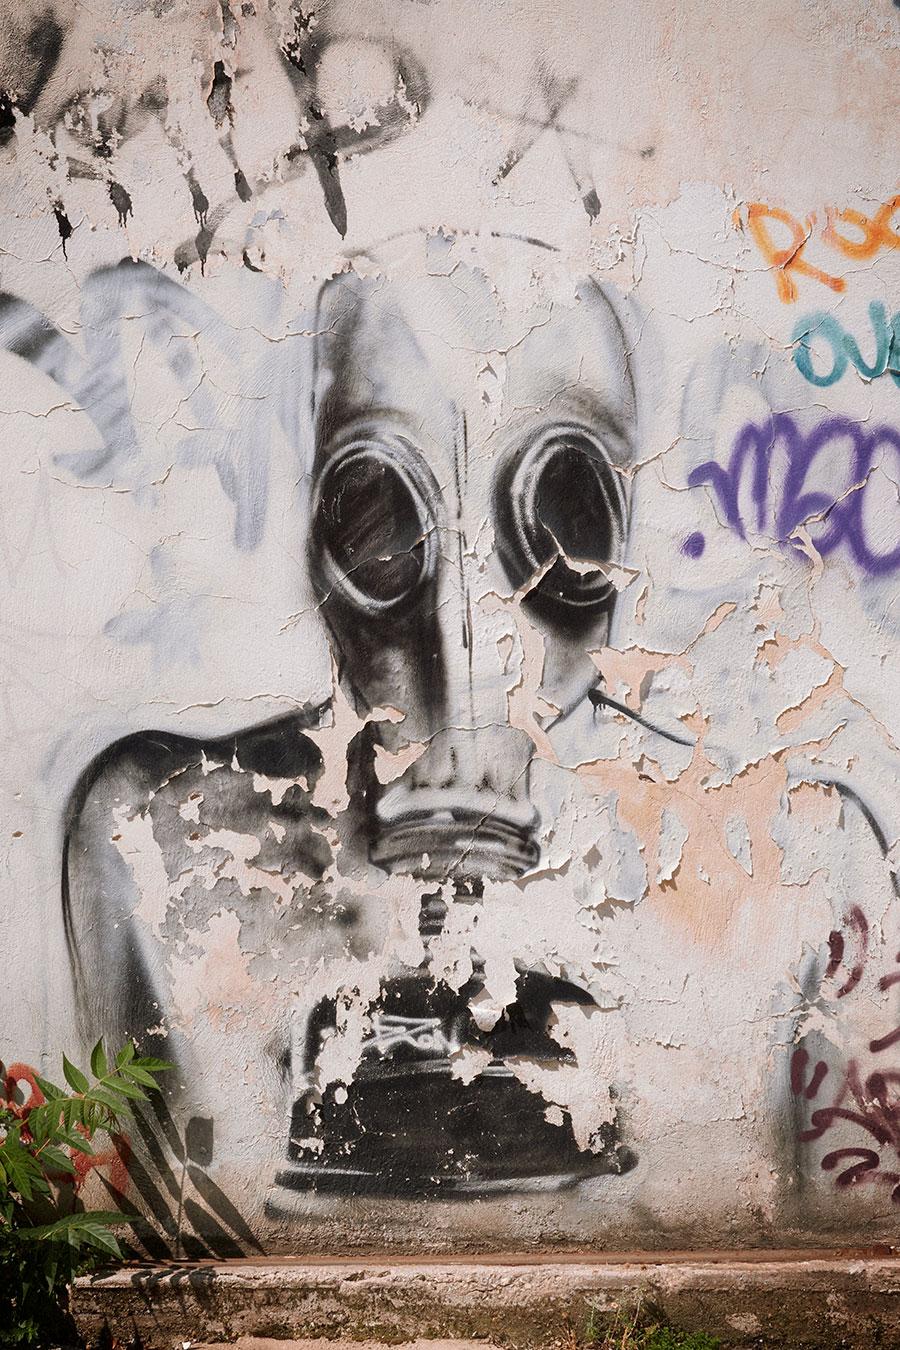 Atenas y sus grafitis